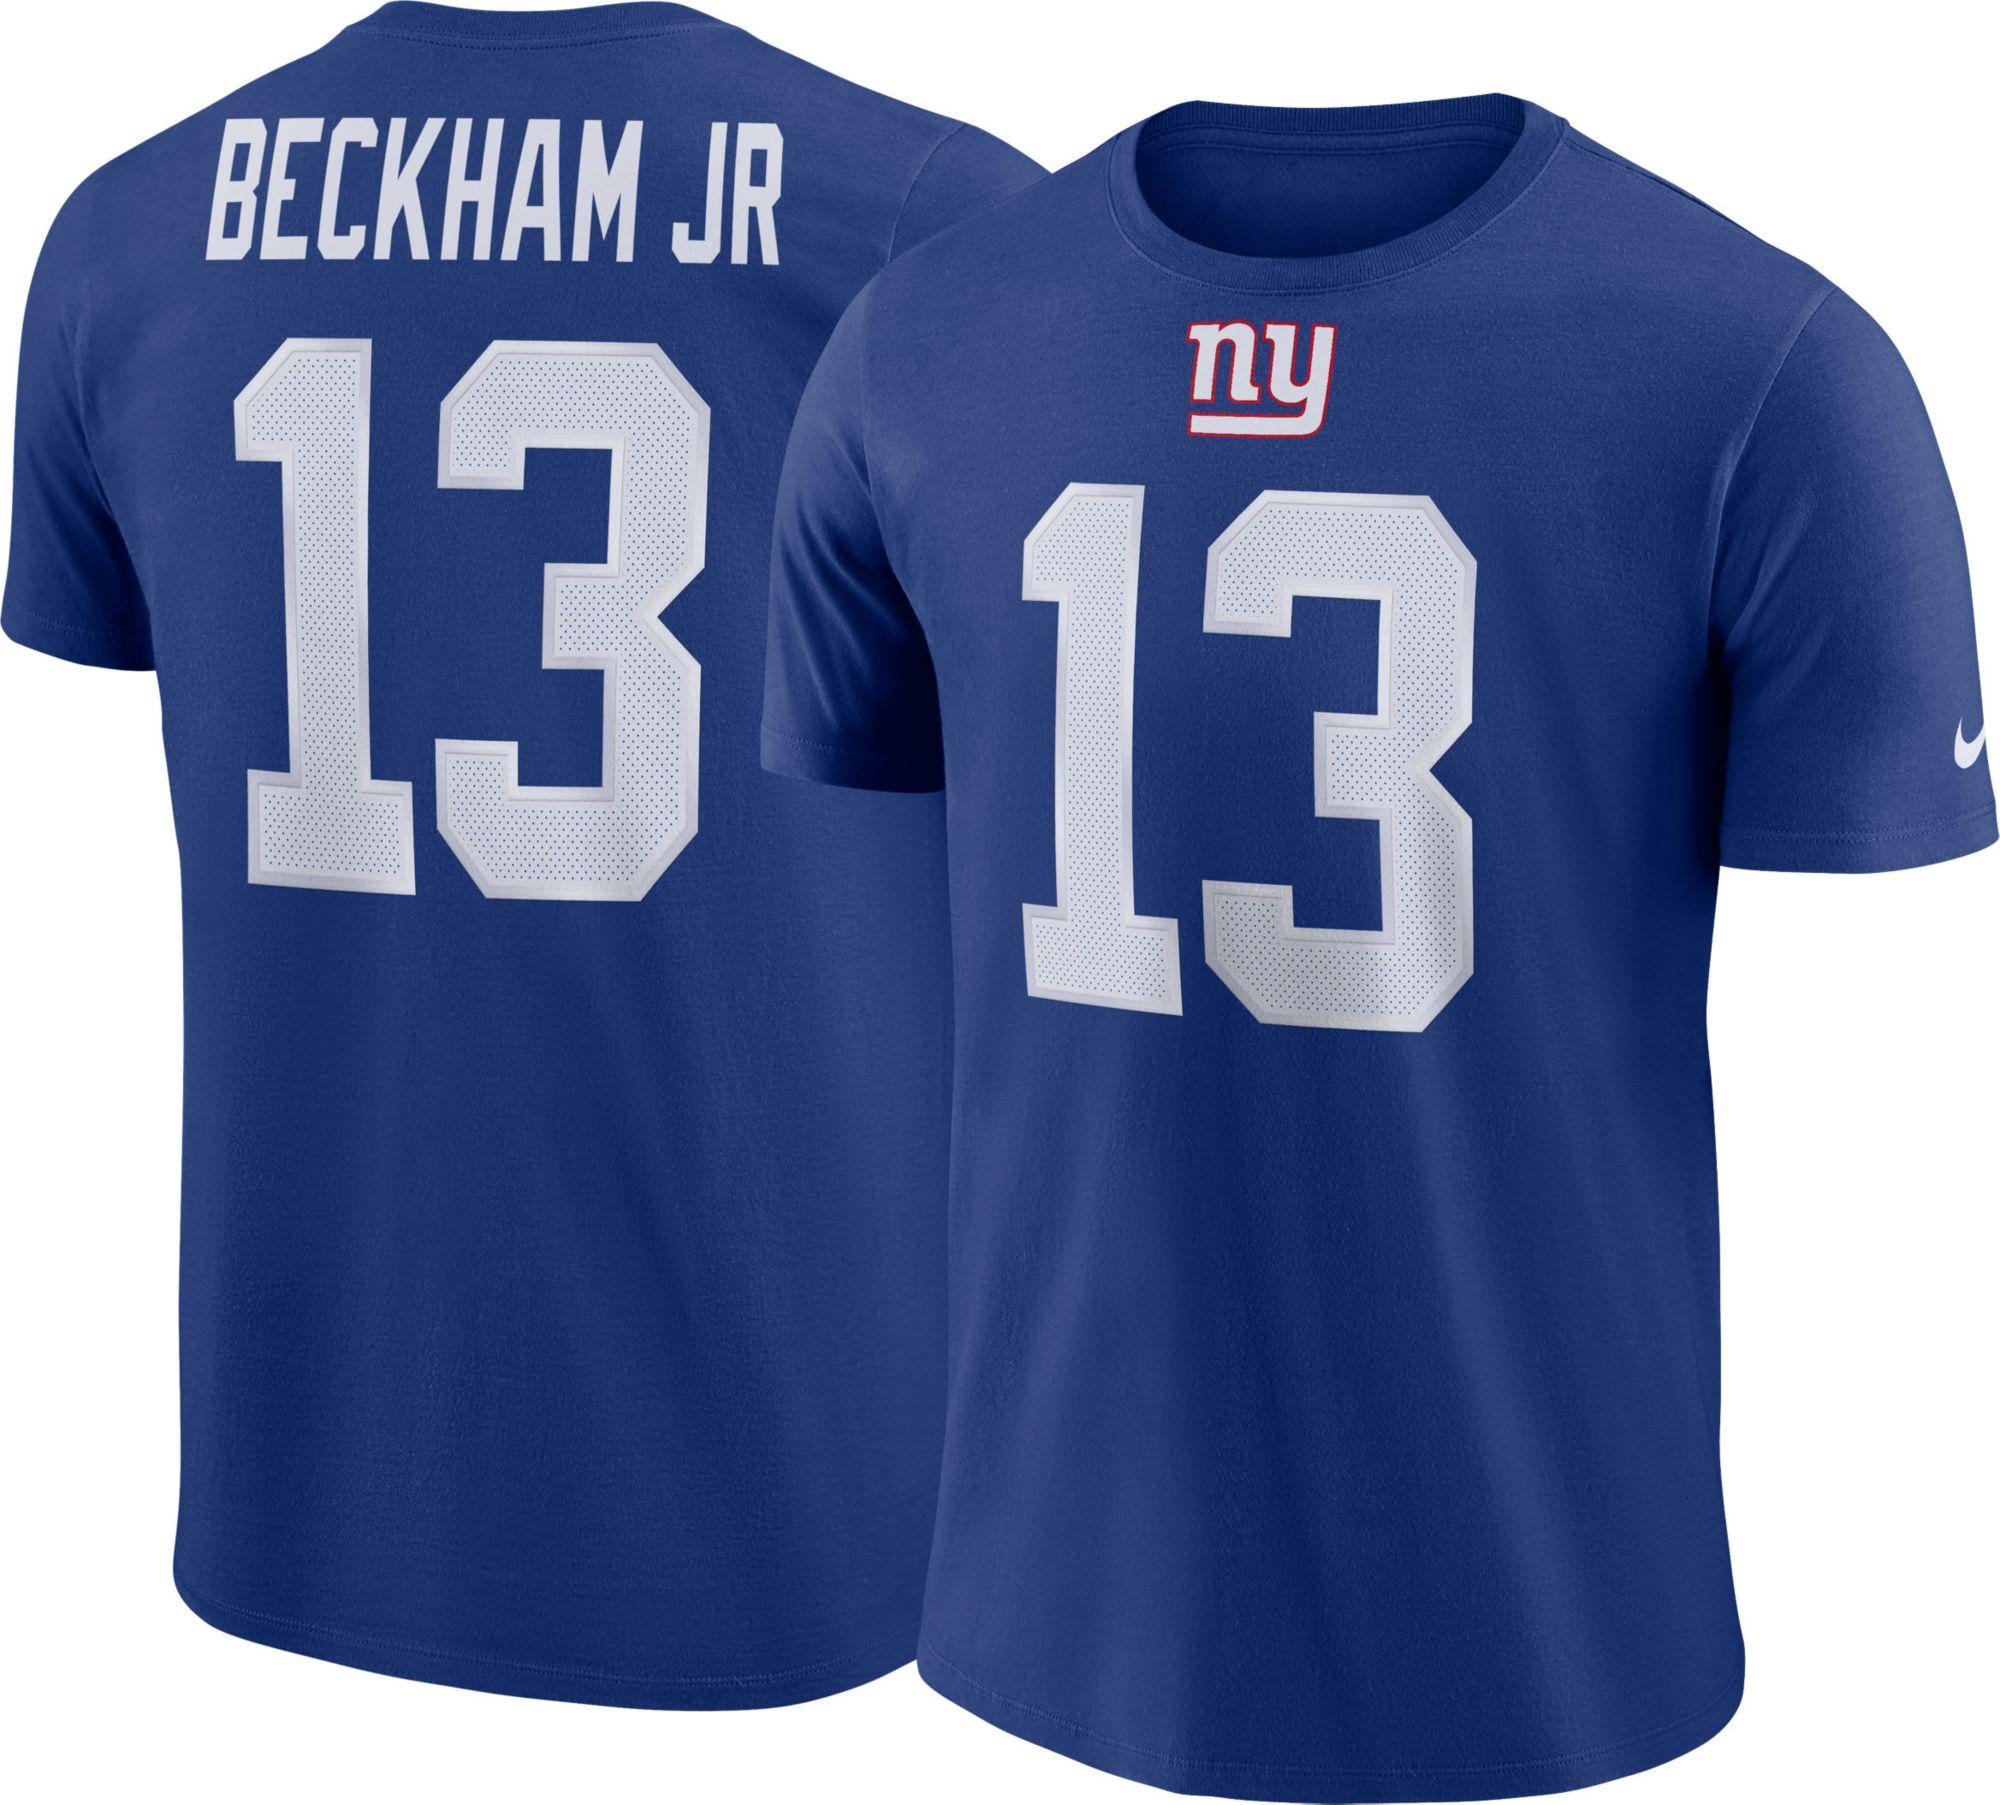 sale retailer a2980 6b9ae new york giants odell beckham jersey